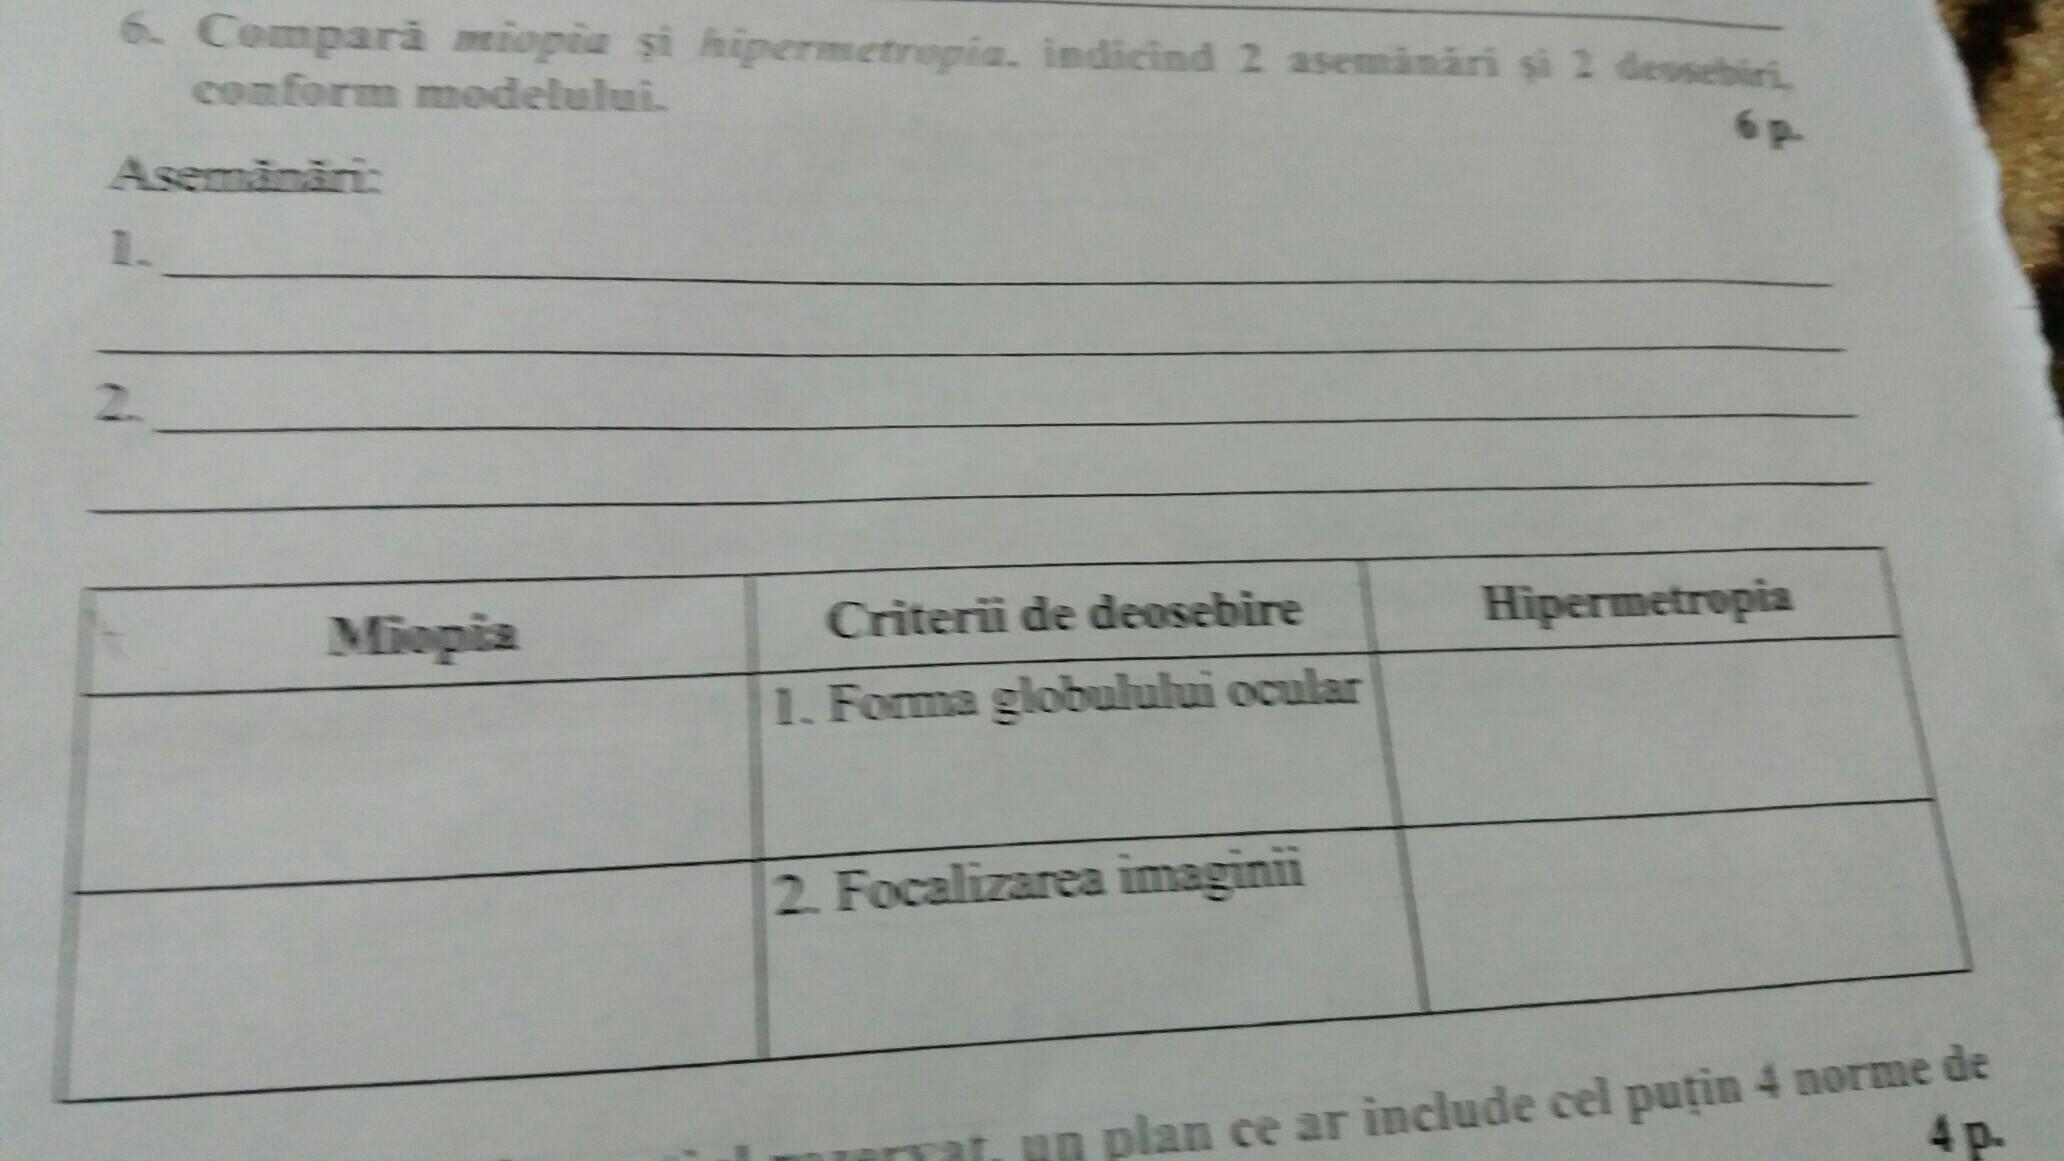 miopia și hipermetropia sunt ambele nume